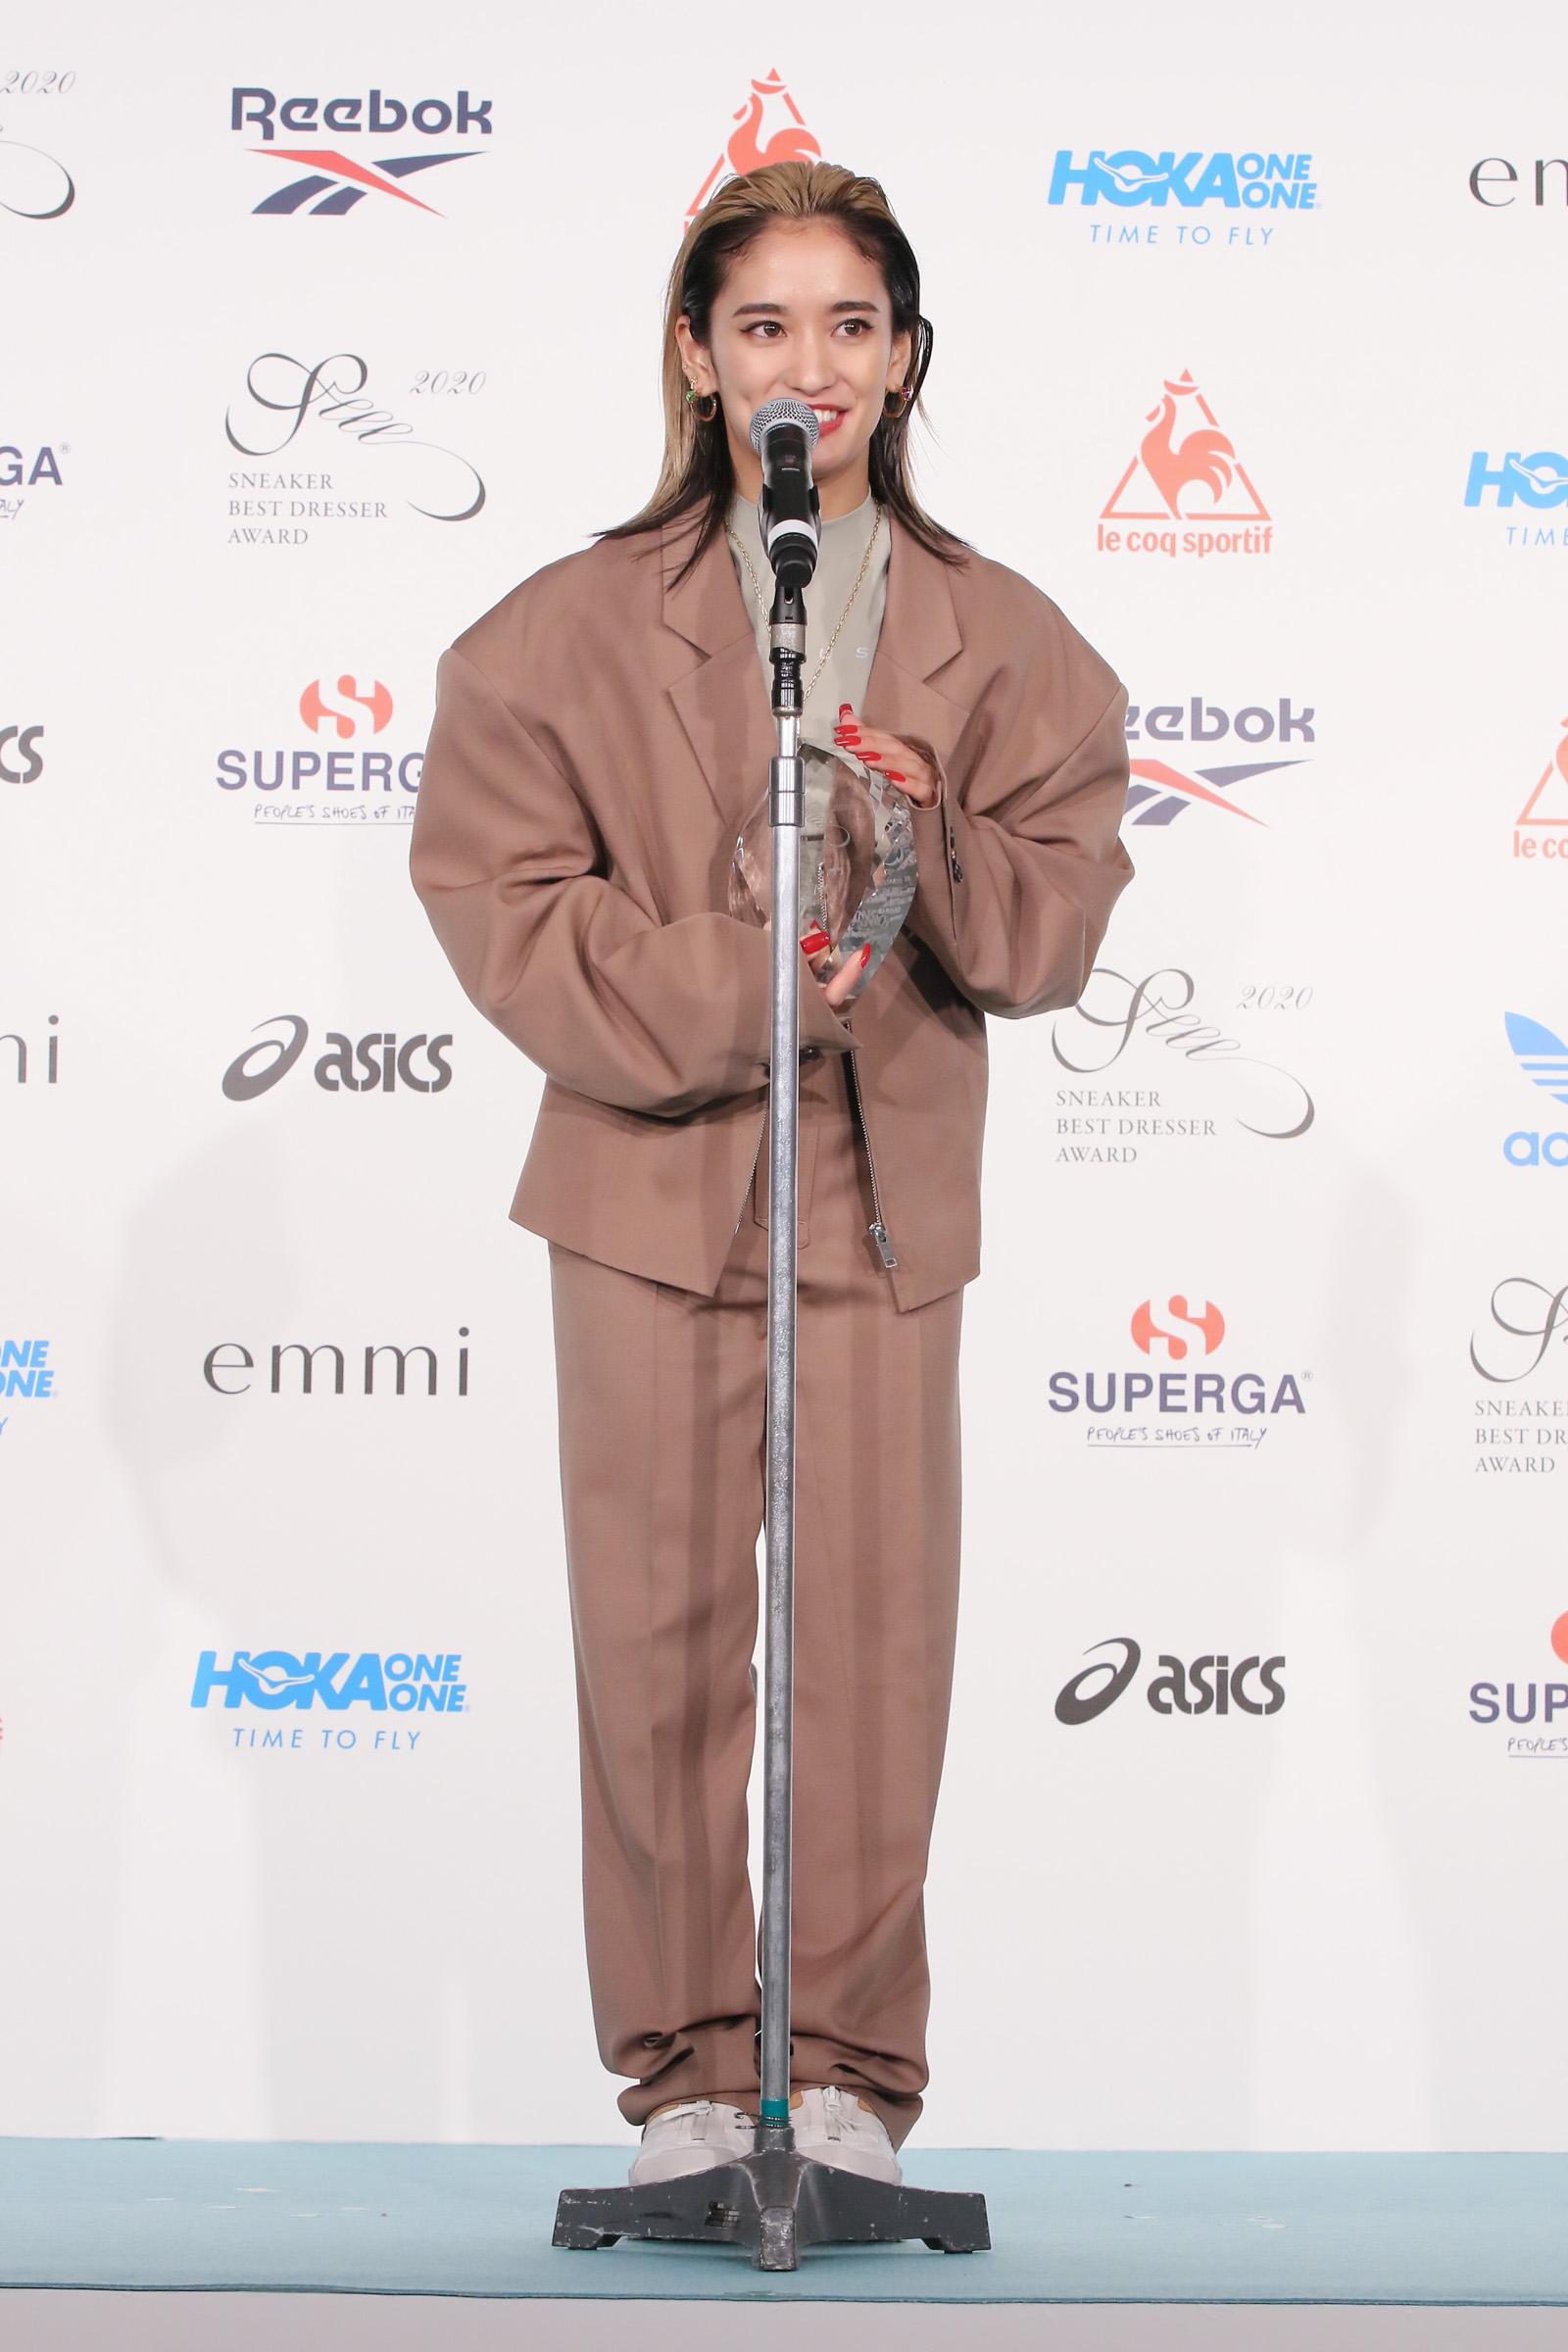 YURINO/スニーカーベストドレッサー賞2020」授賞式にて(2020年2月20日、東京都内・ホテル椿山荘東京)